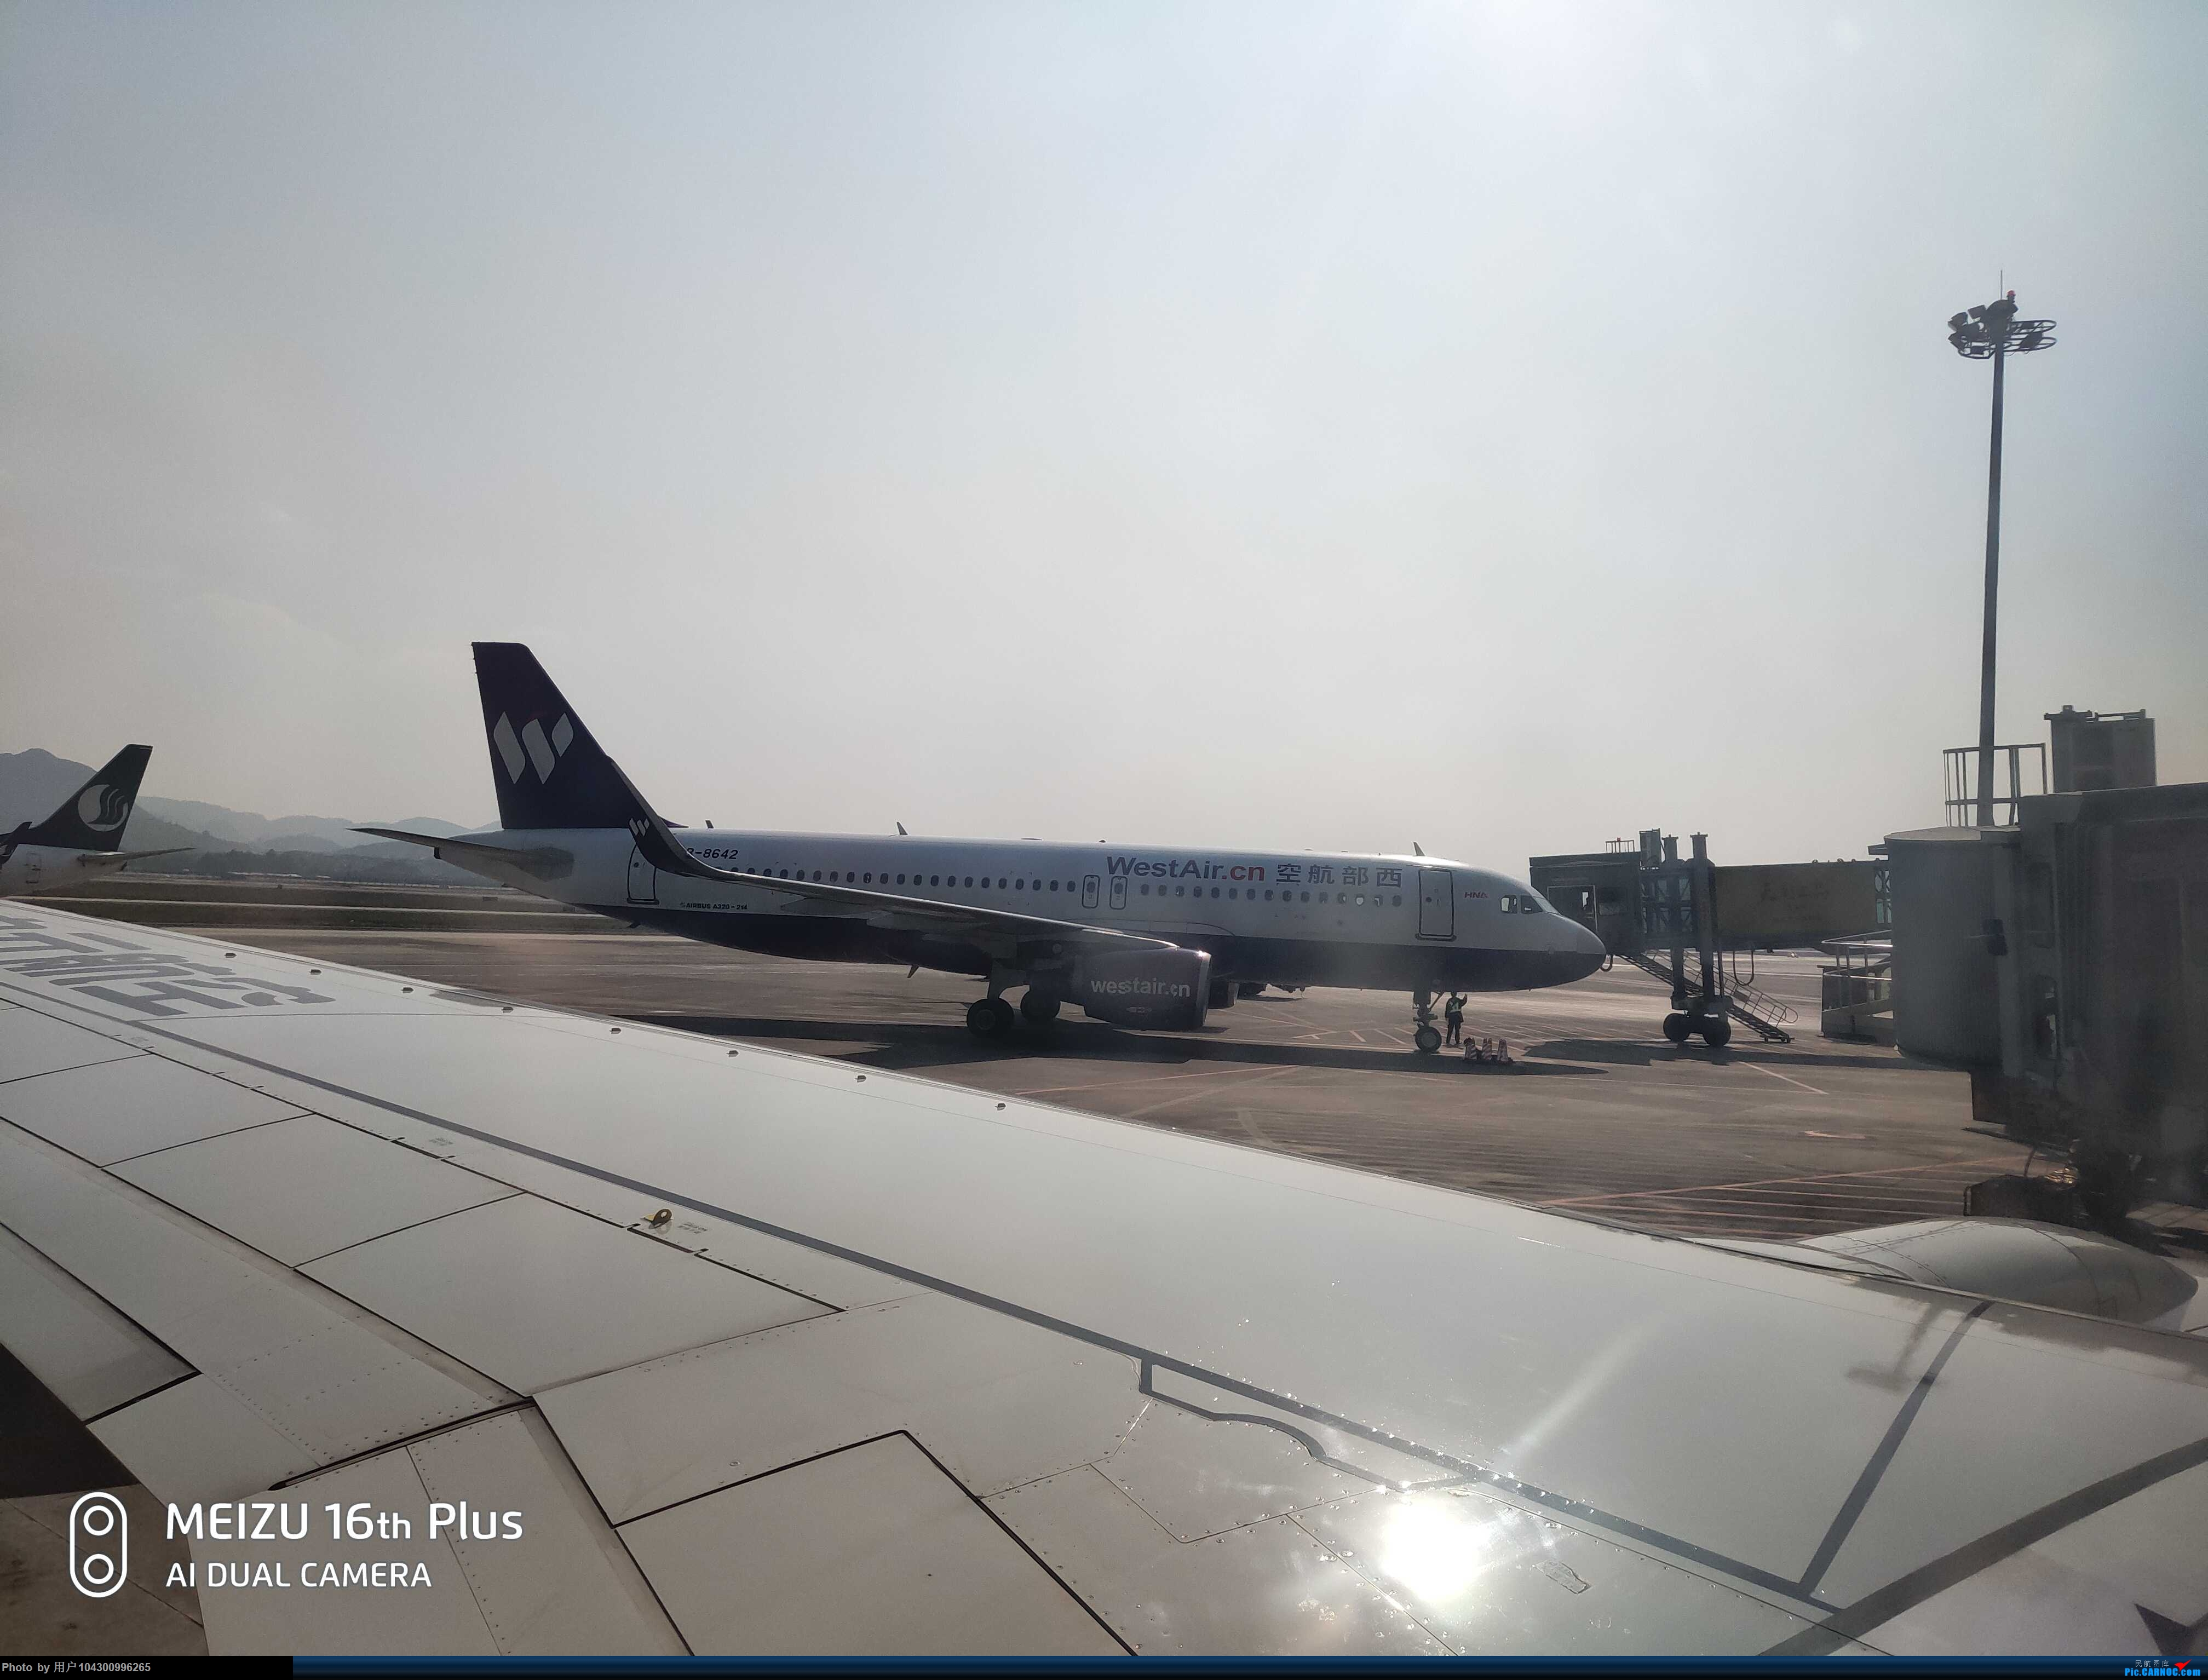 Re:[原创]DM游记之AQ&TV贵阳-兰州往返 AIRBUS A320-200 B-8642 中国贵阳龙洞堡国际机场